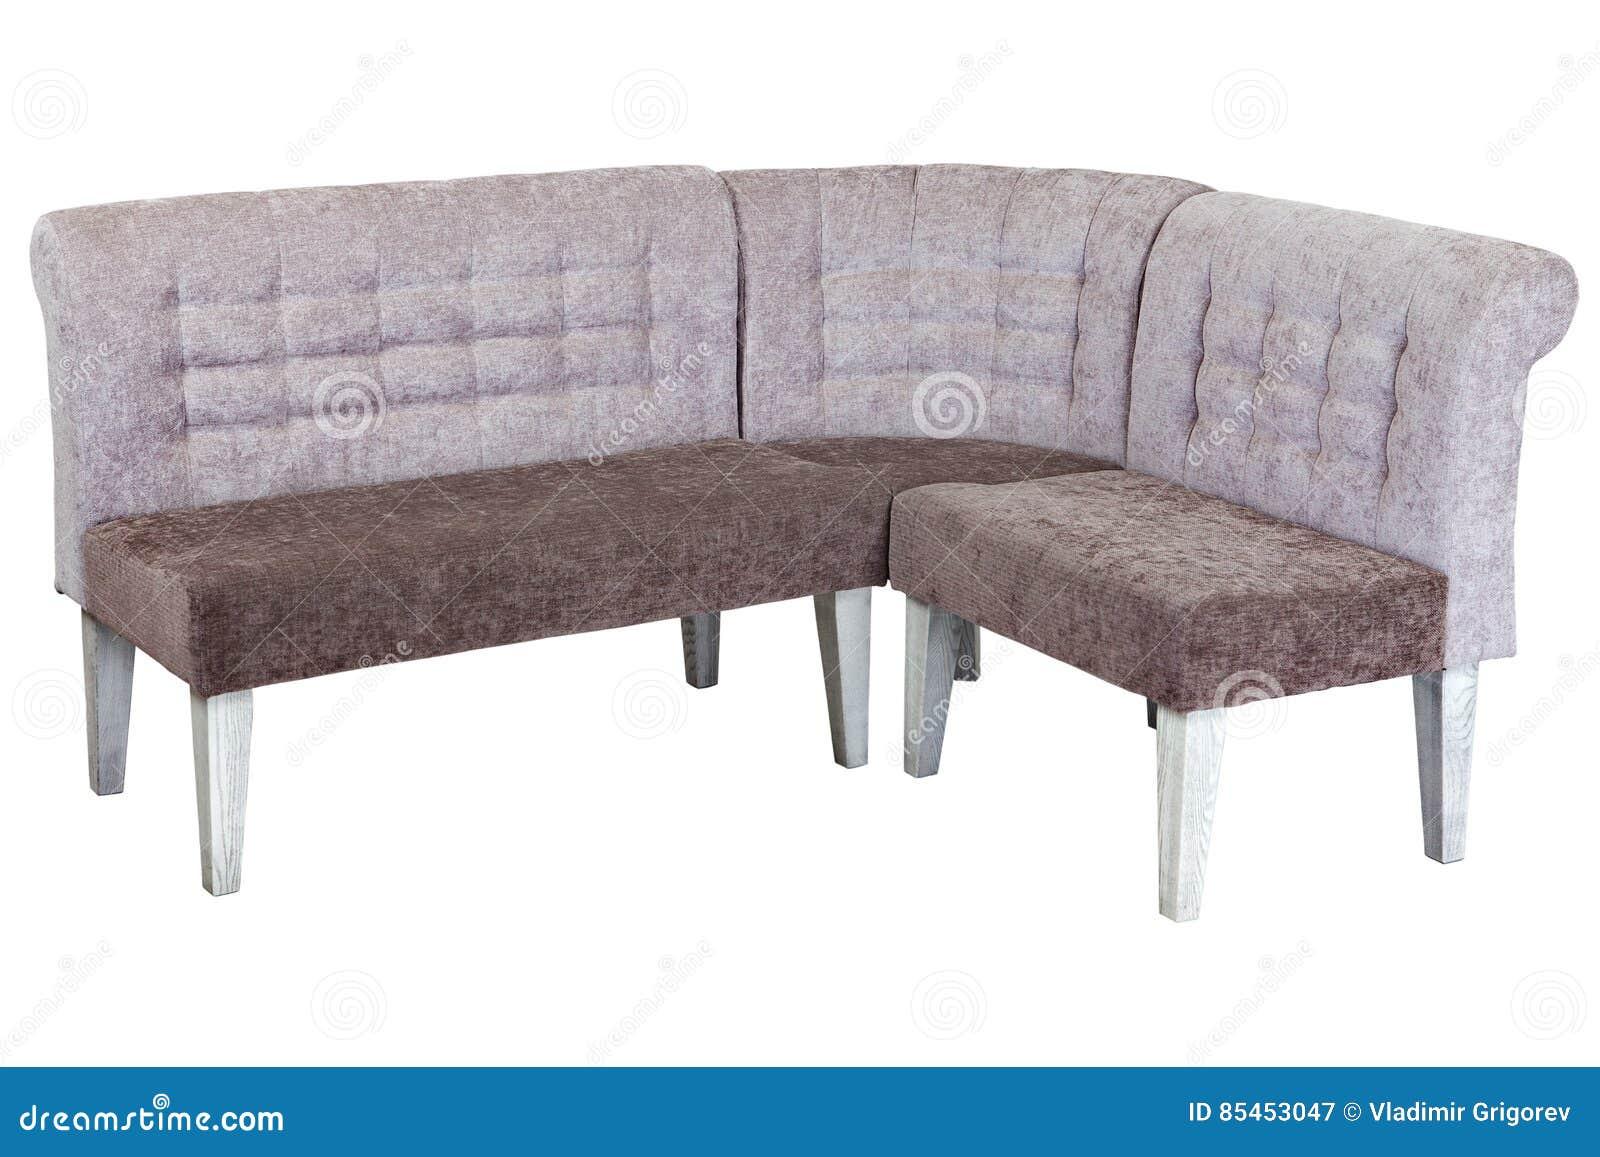 Amazing Corner Bench With Seat And Backrest Upholstered On White Evergreenethics Interior Chair Design Evergreenethicsorg